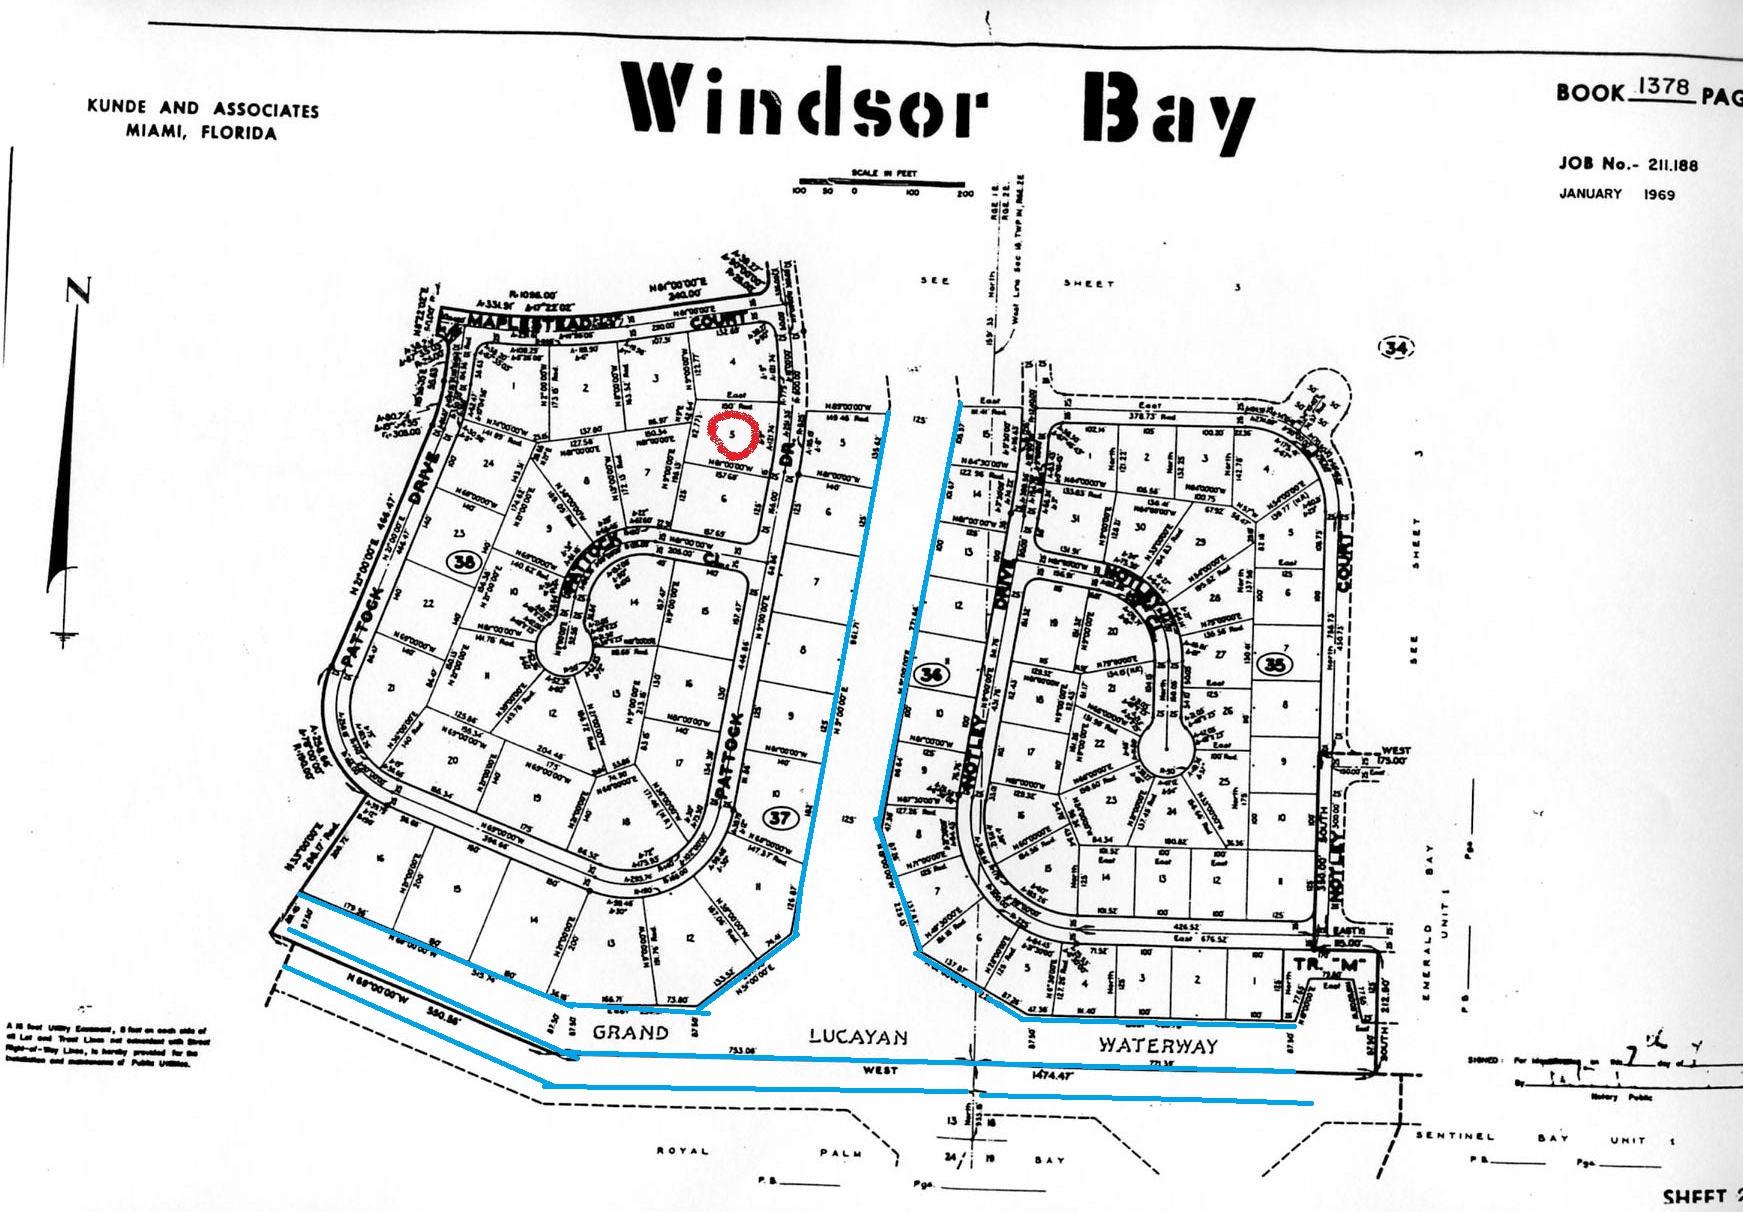 Windsor Bay, Block 38, Lot 5